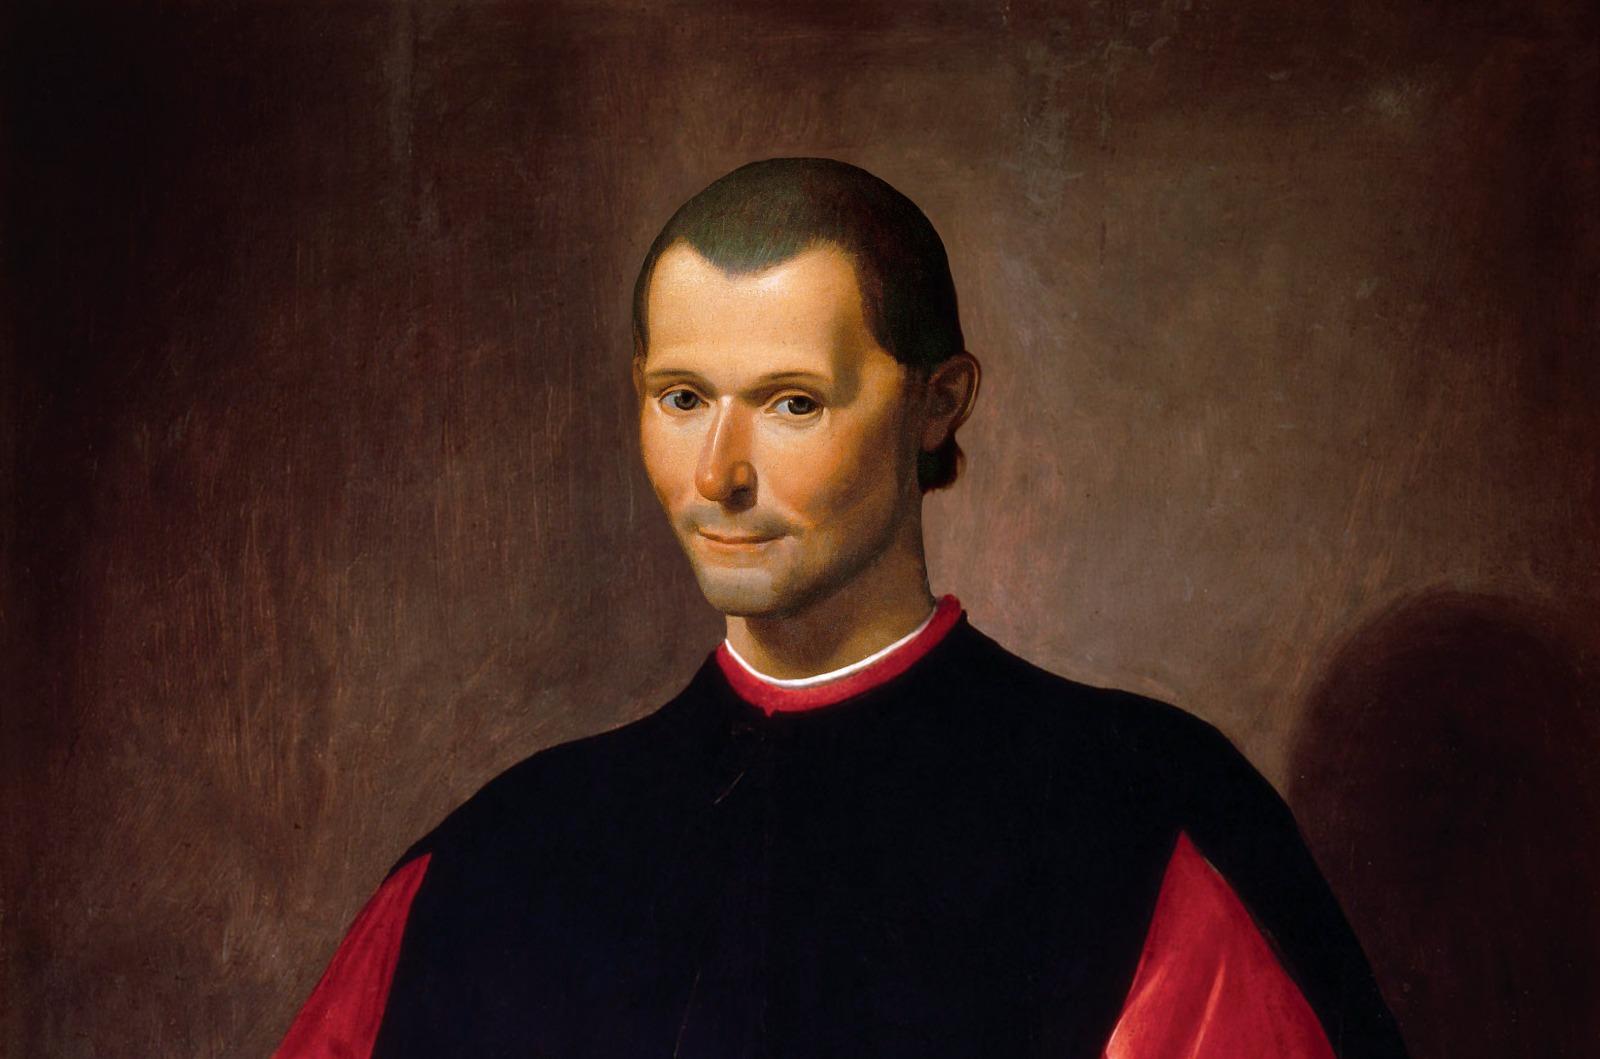 Niccolò Machiavelli etica nel principe